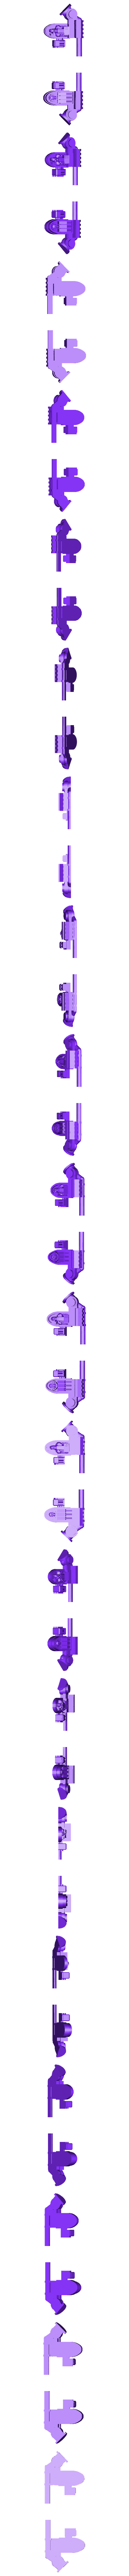 mk_d-4lt_pc_emplacement_mod.stl Download free STL file Big Plasma Cannon Turret • 3D printing design, JtStrait72